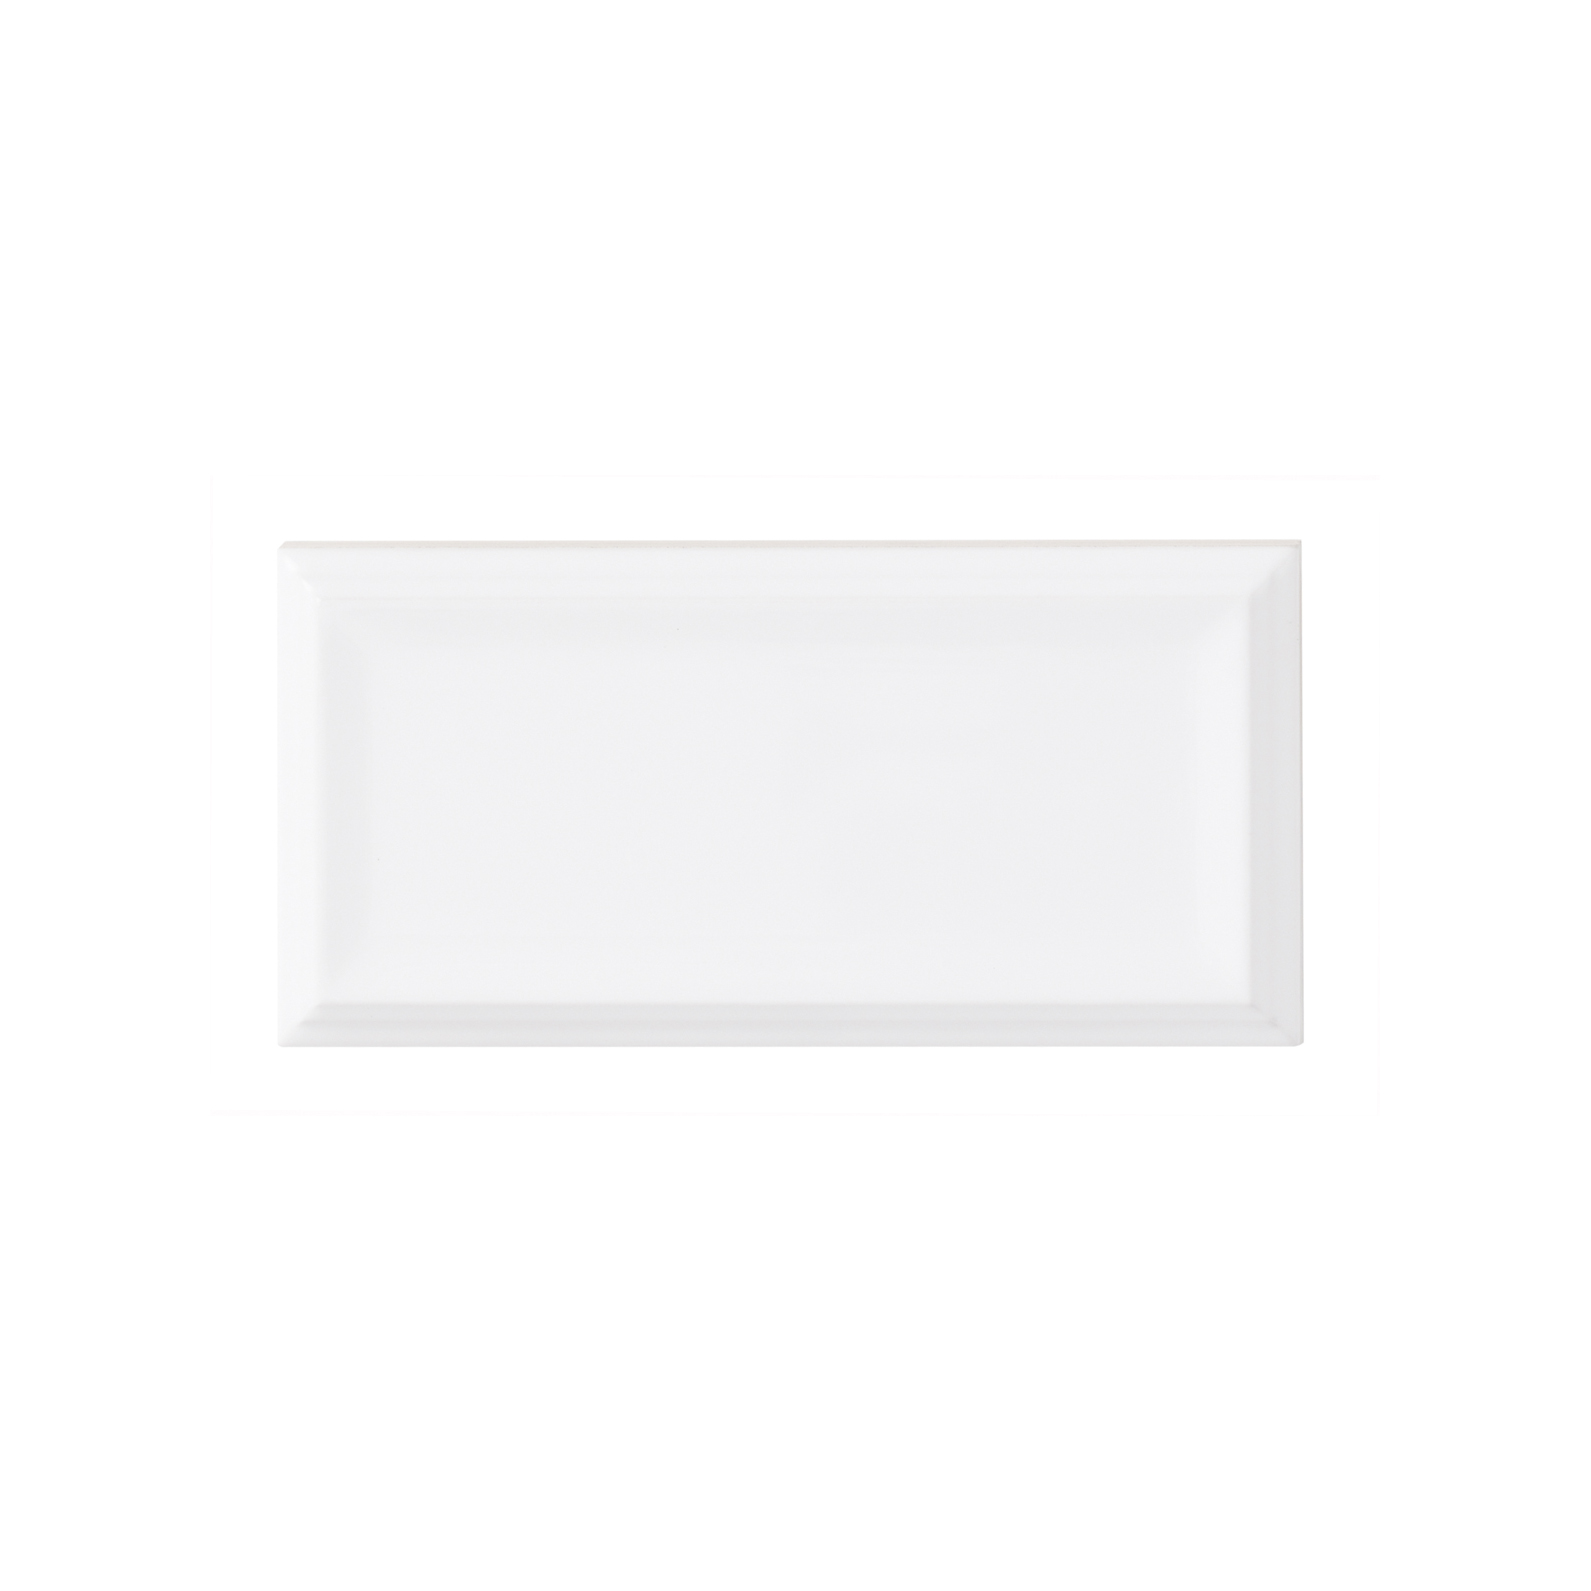 ADEX-ADST1070-LISO-FRAMED   -7.3 cm-14.8 cm-STUDIO>SNOW CAP